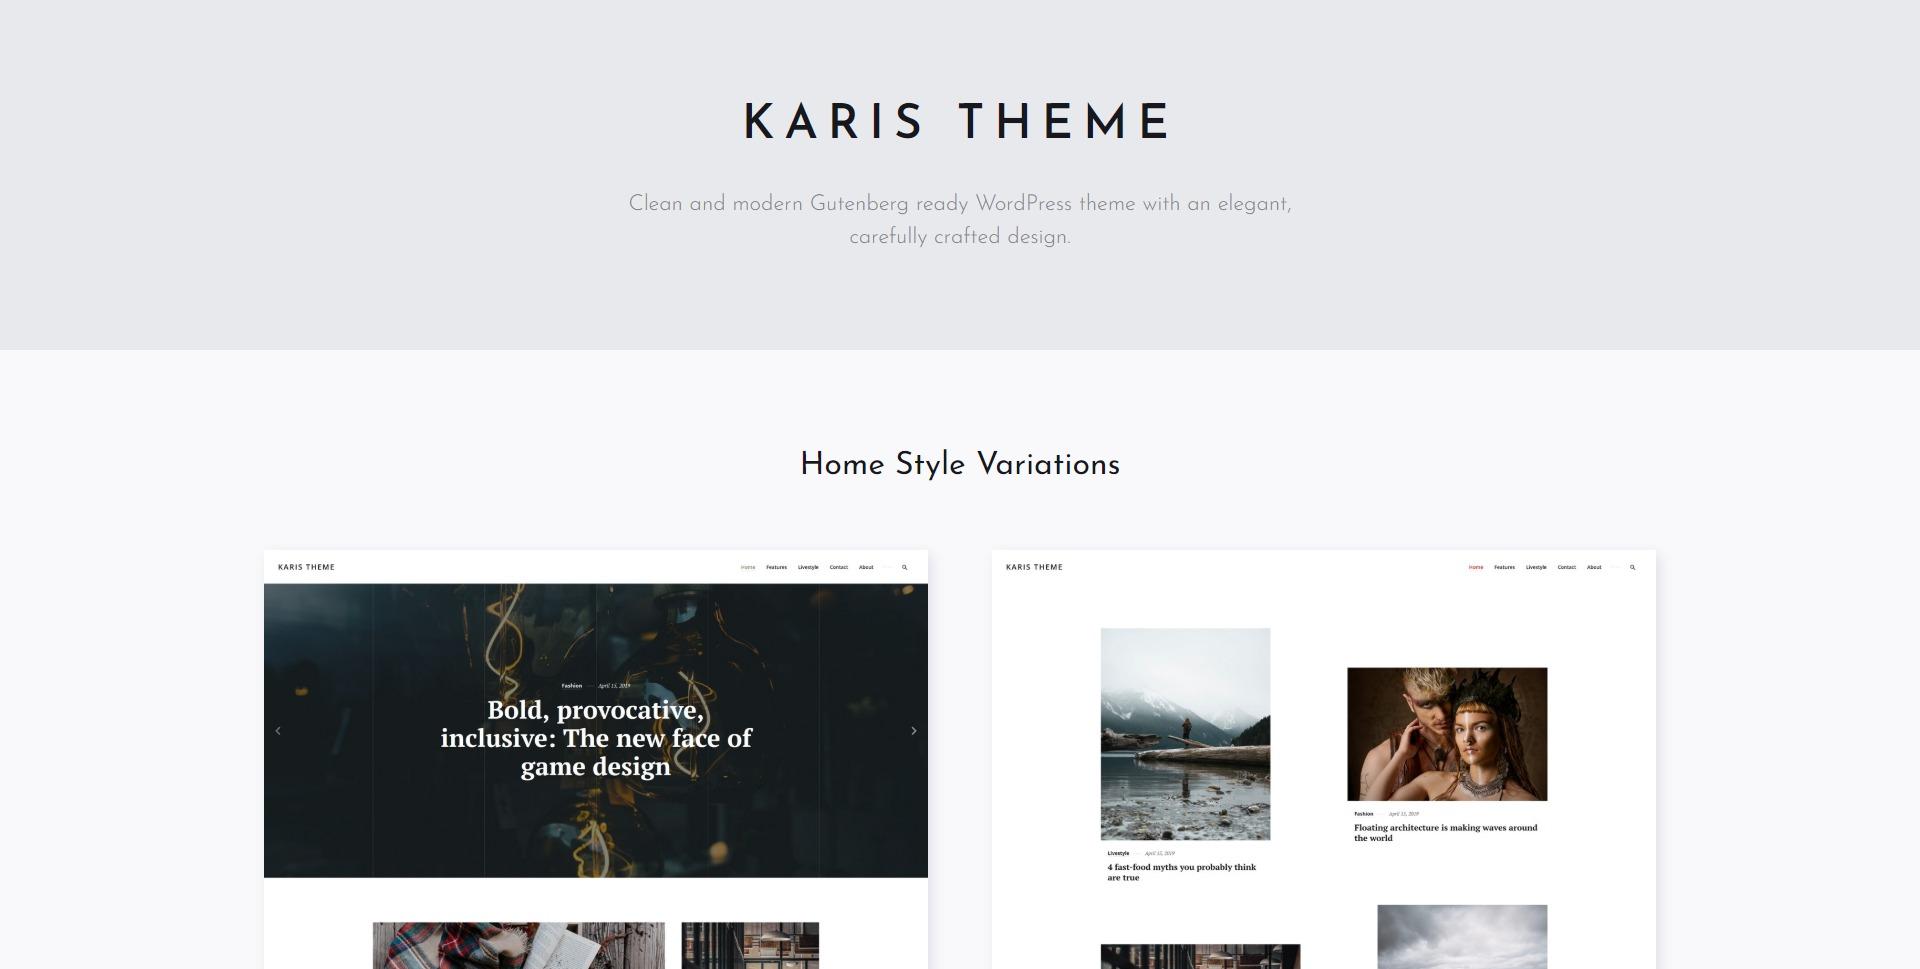 Karis-博客新闻杂志图片WordPress主题